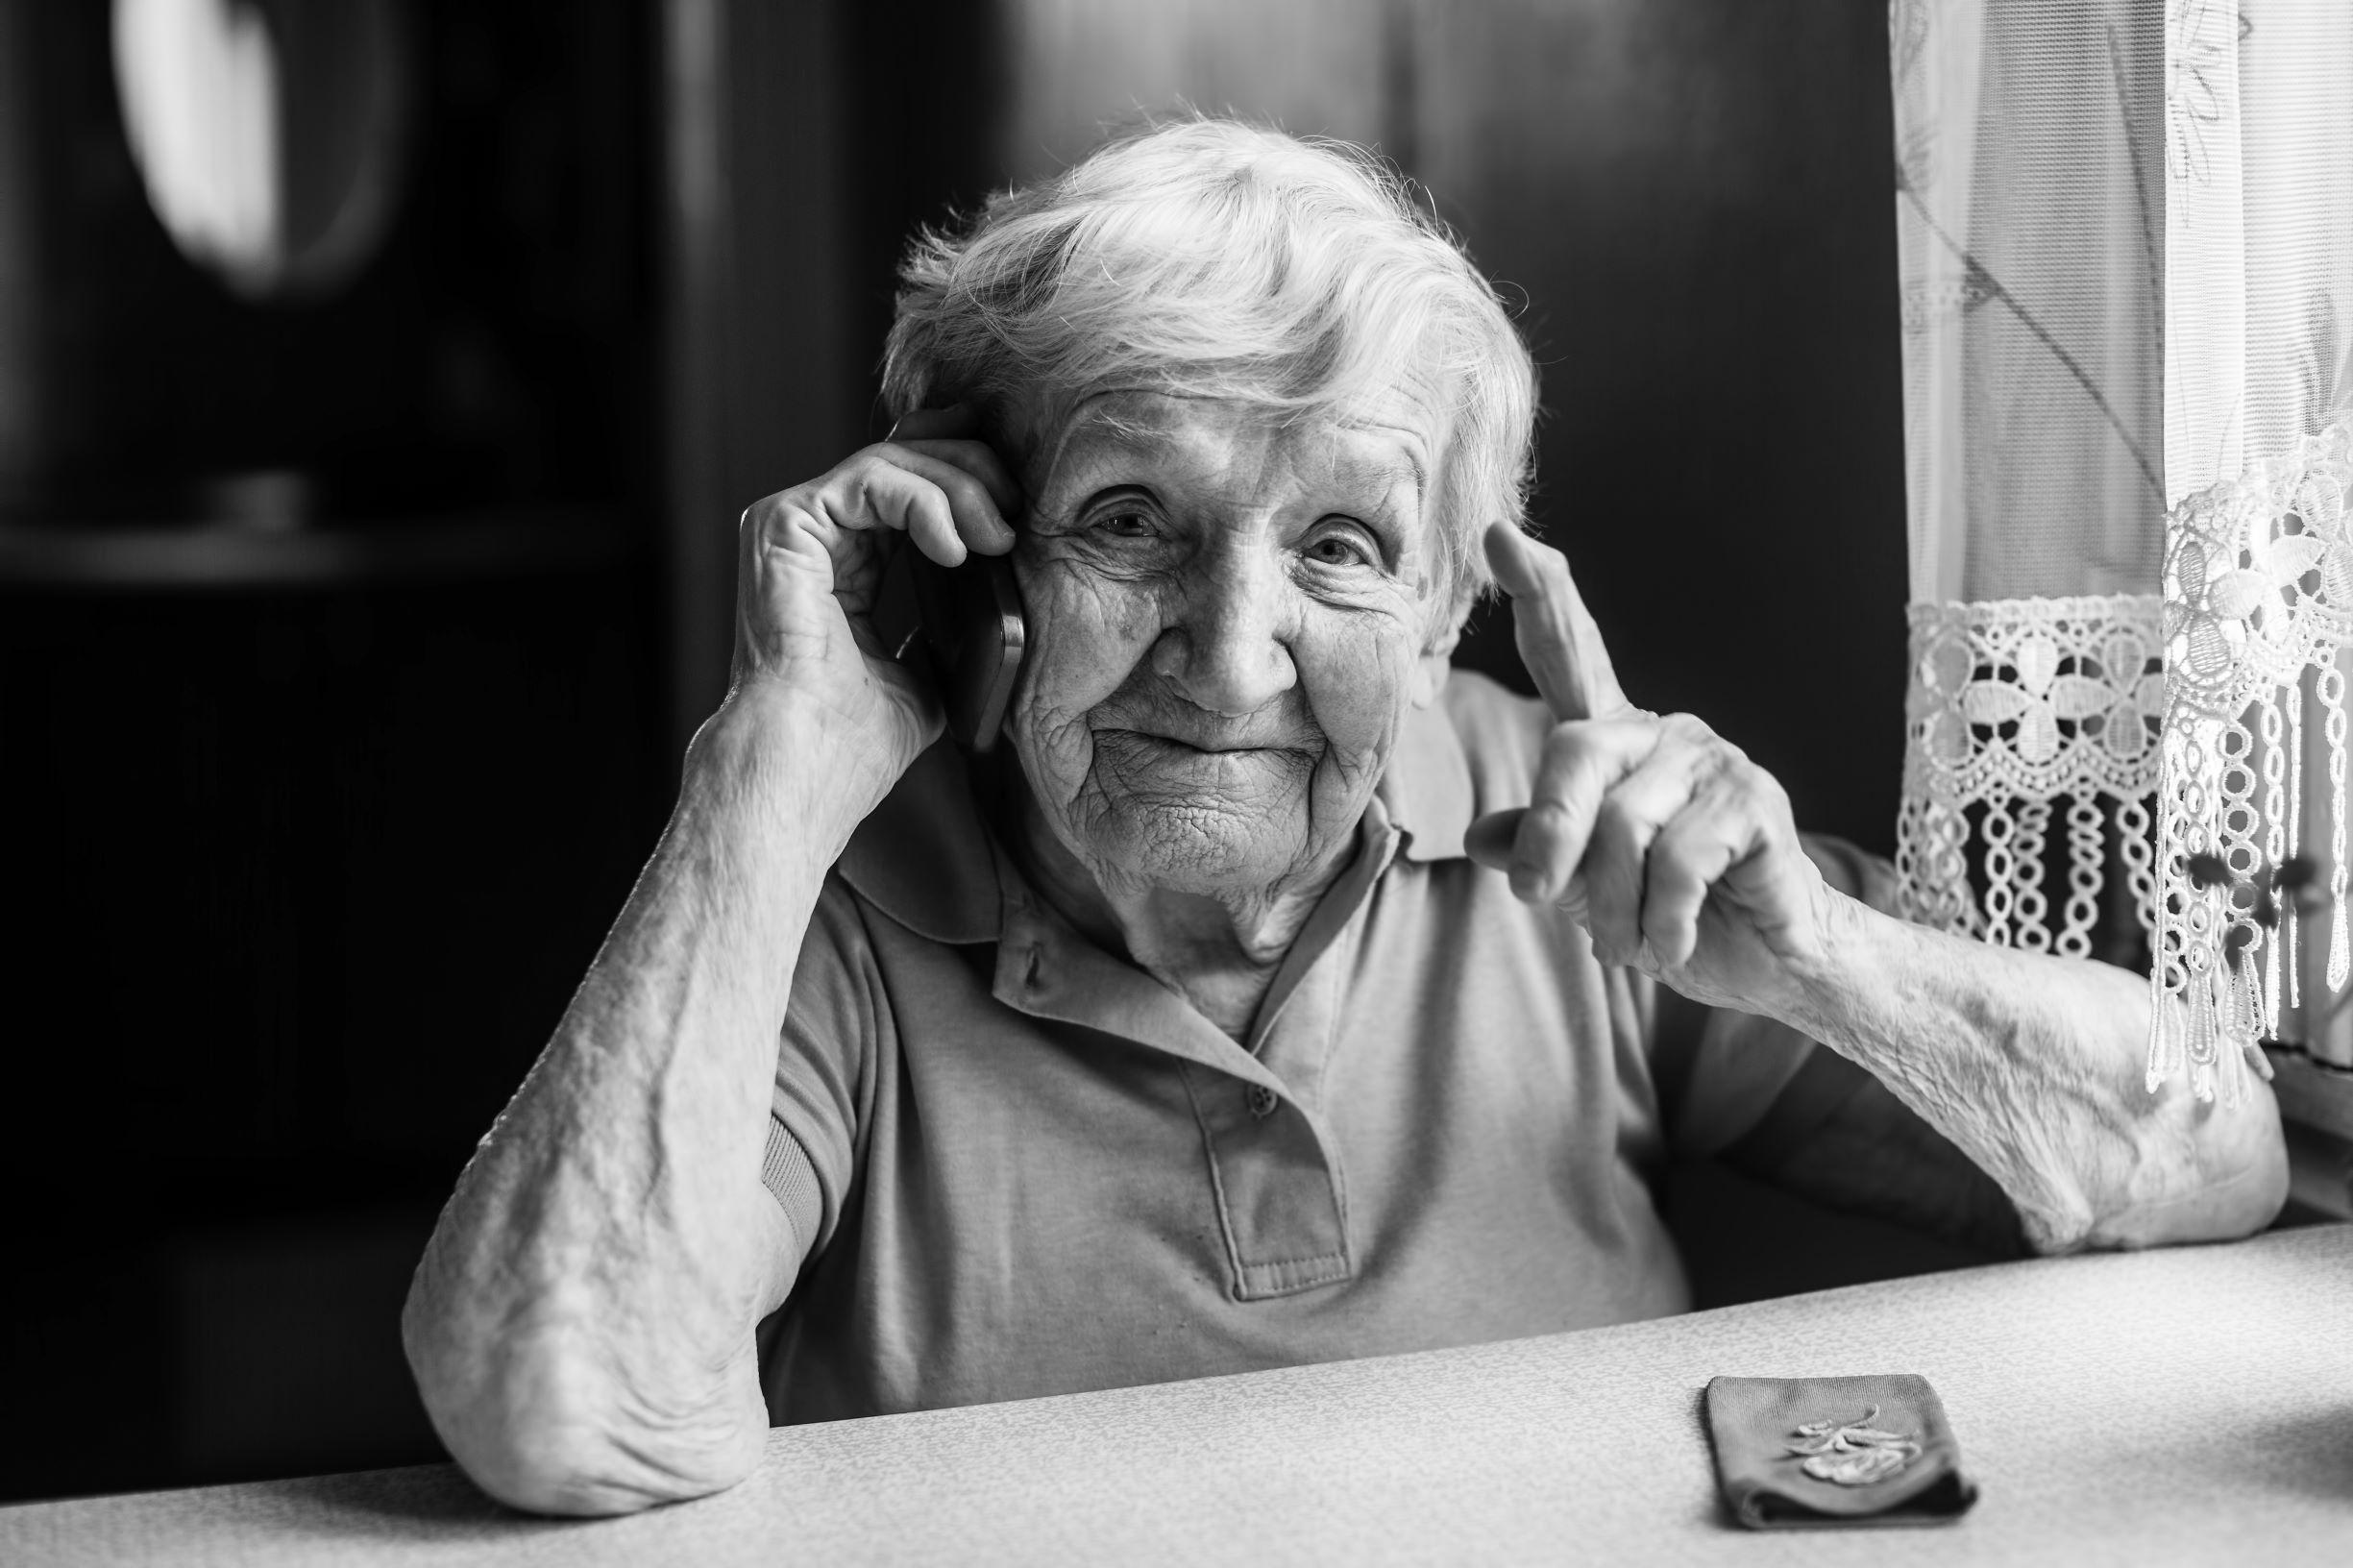 elderly-person-on-phone-2